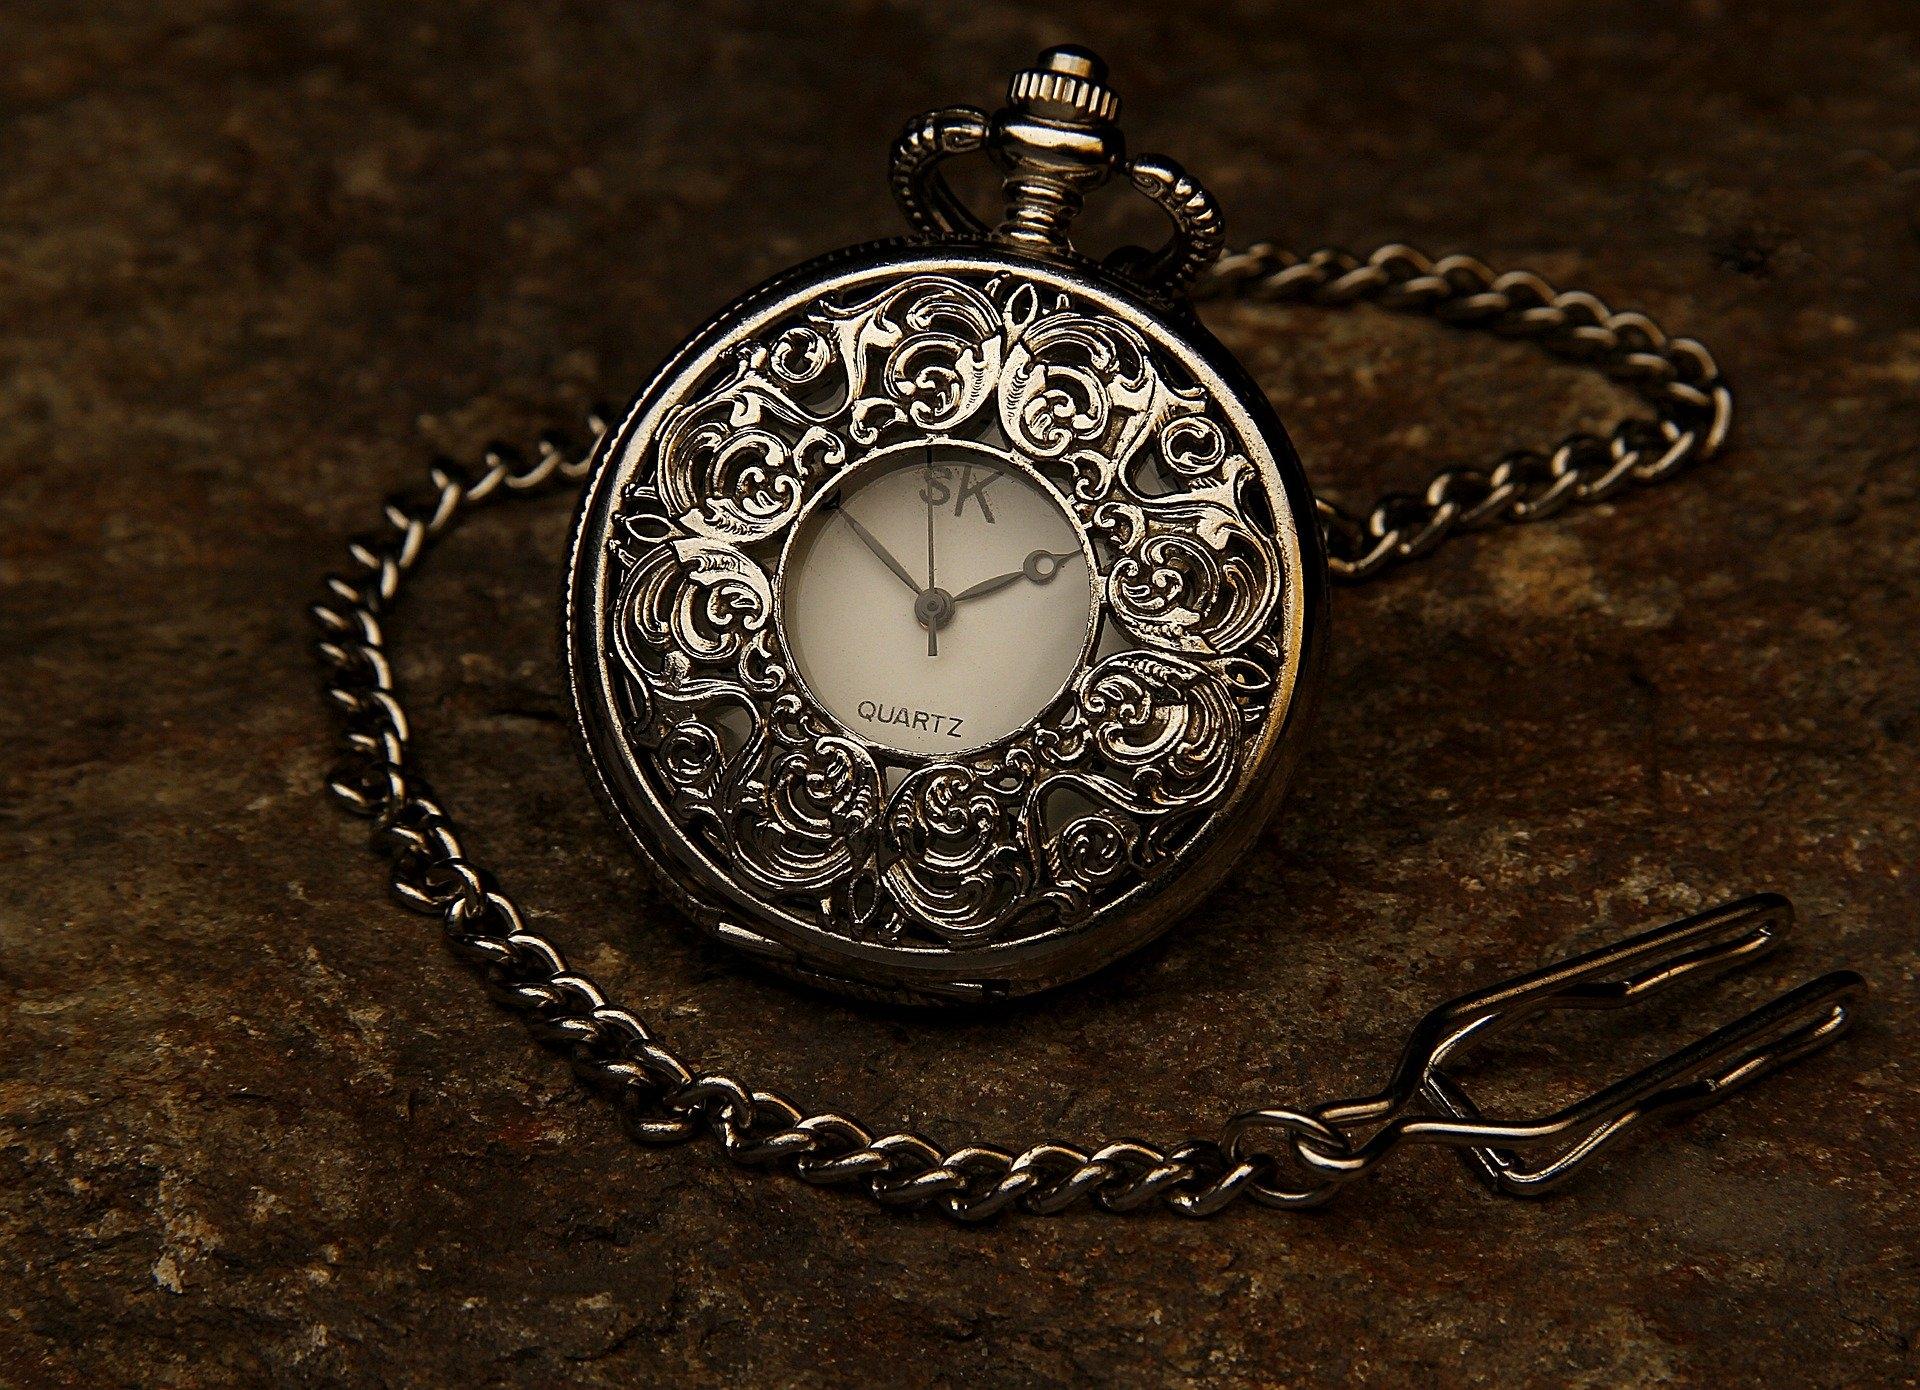 Reparación de relojes de bolsillo antiguos